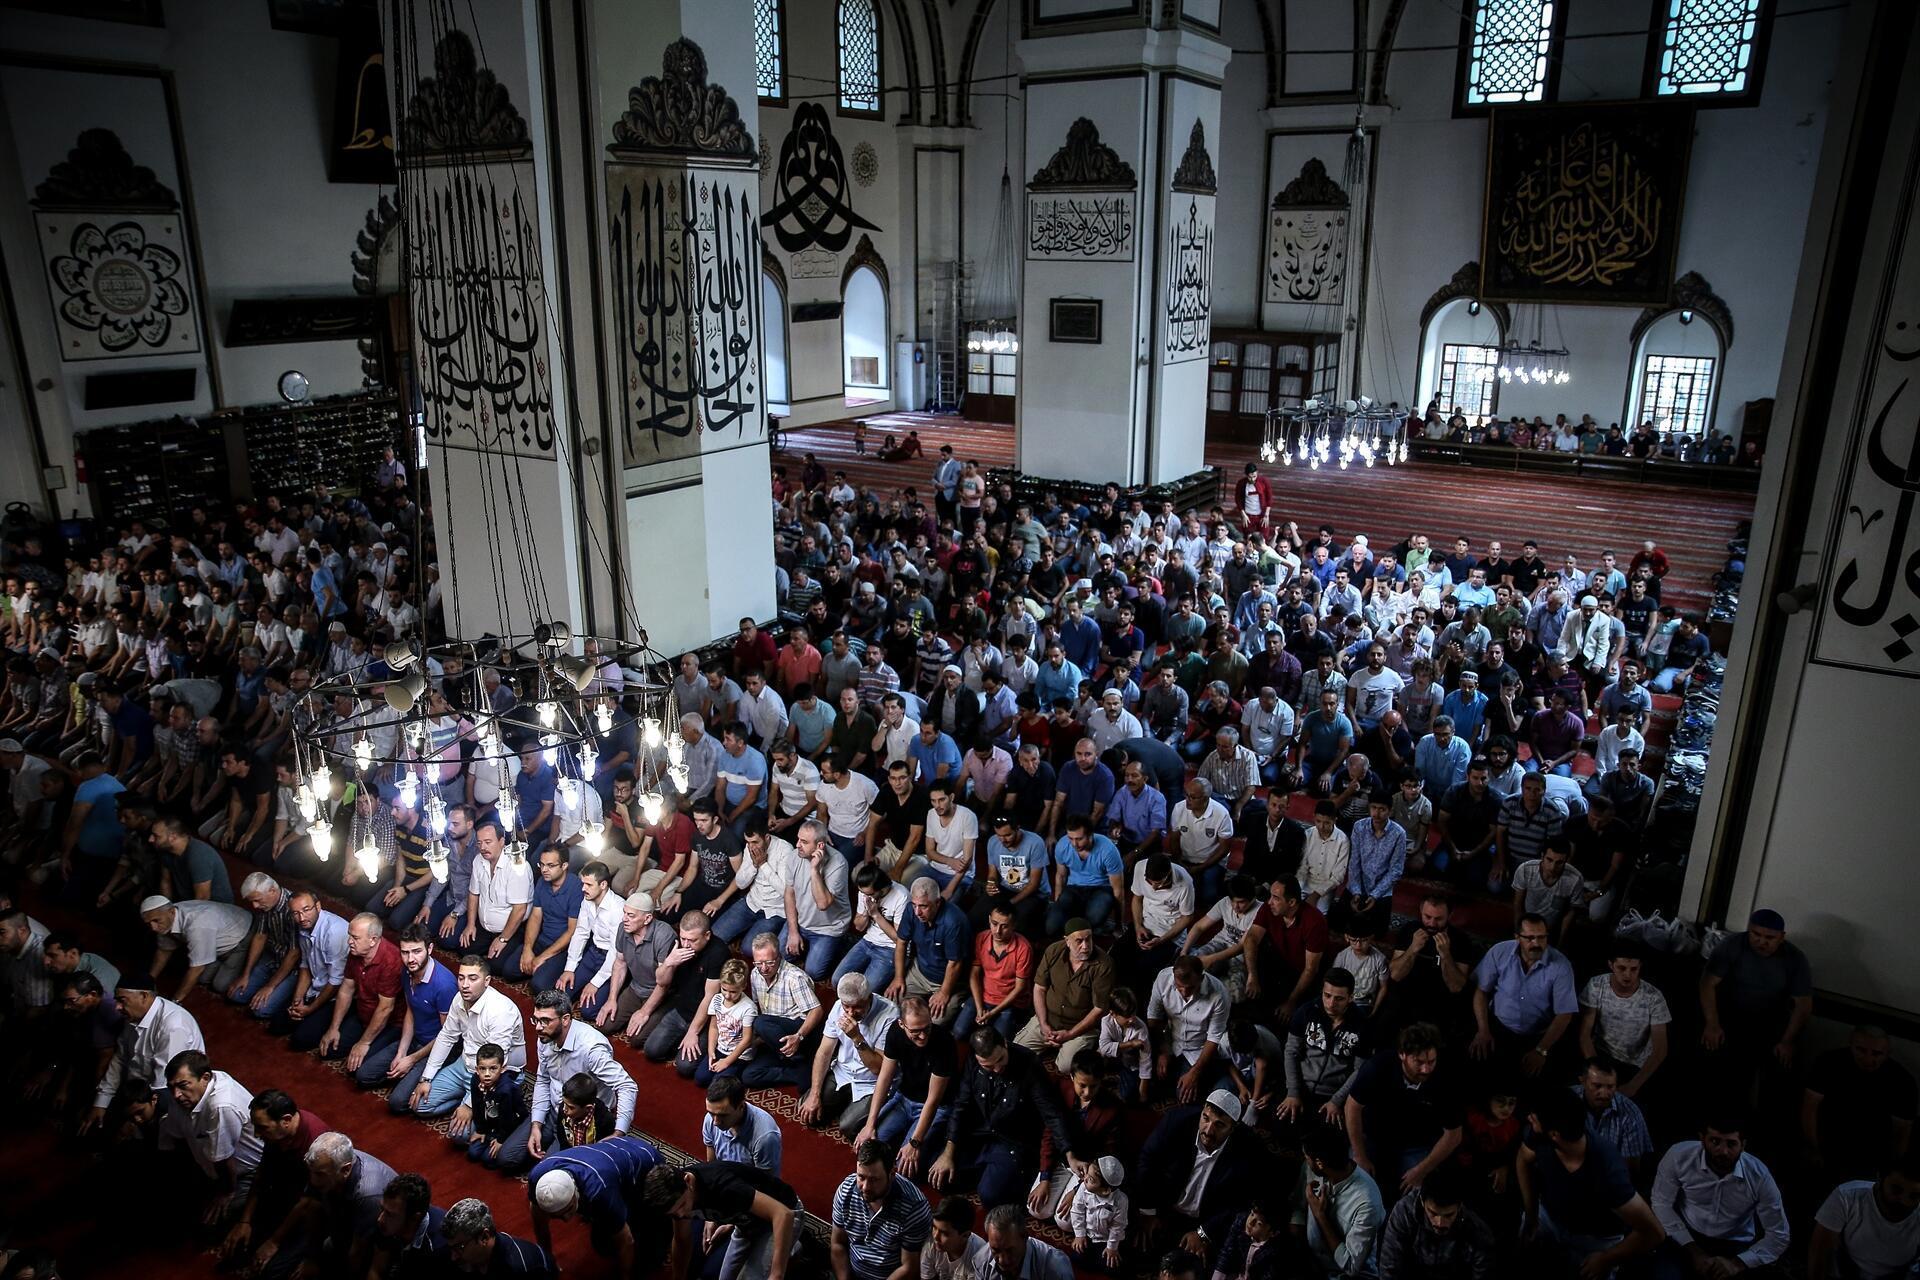 Turkey celebrates Islam's holy Feast of Sacrifice - Turkey News